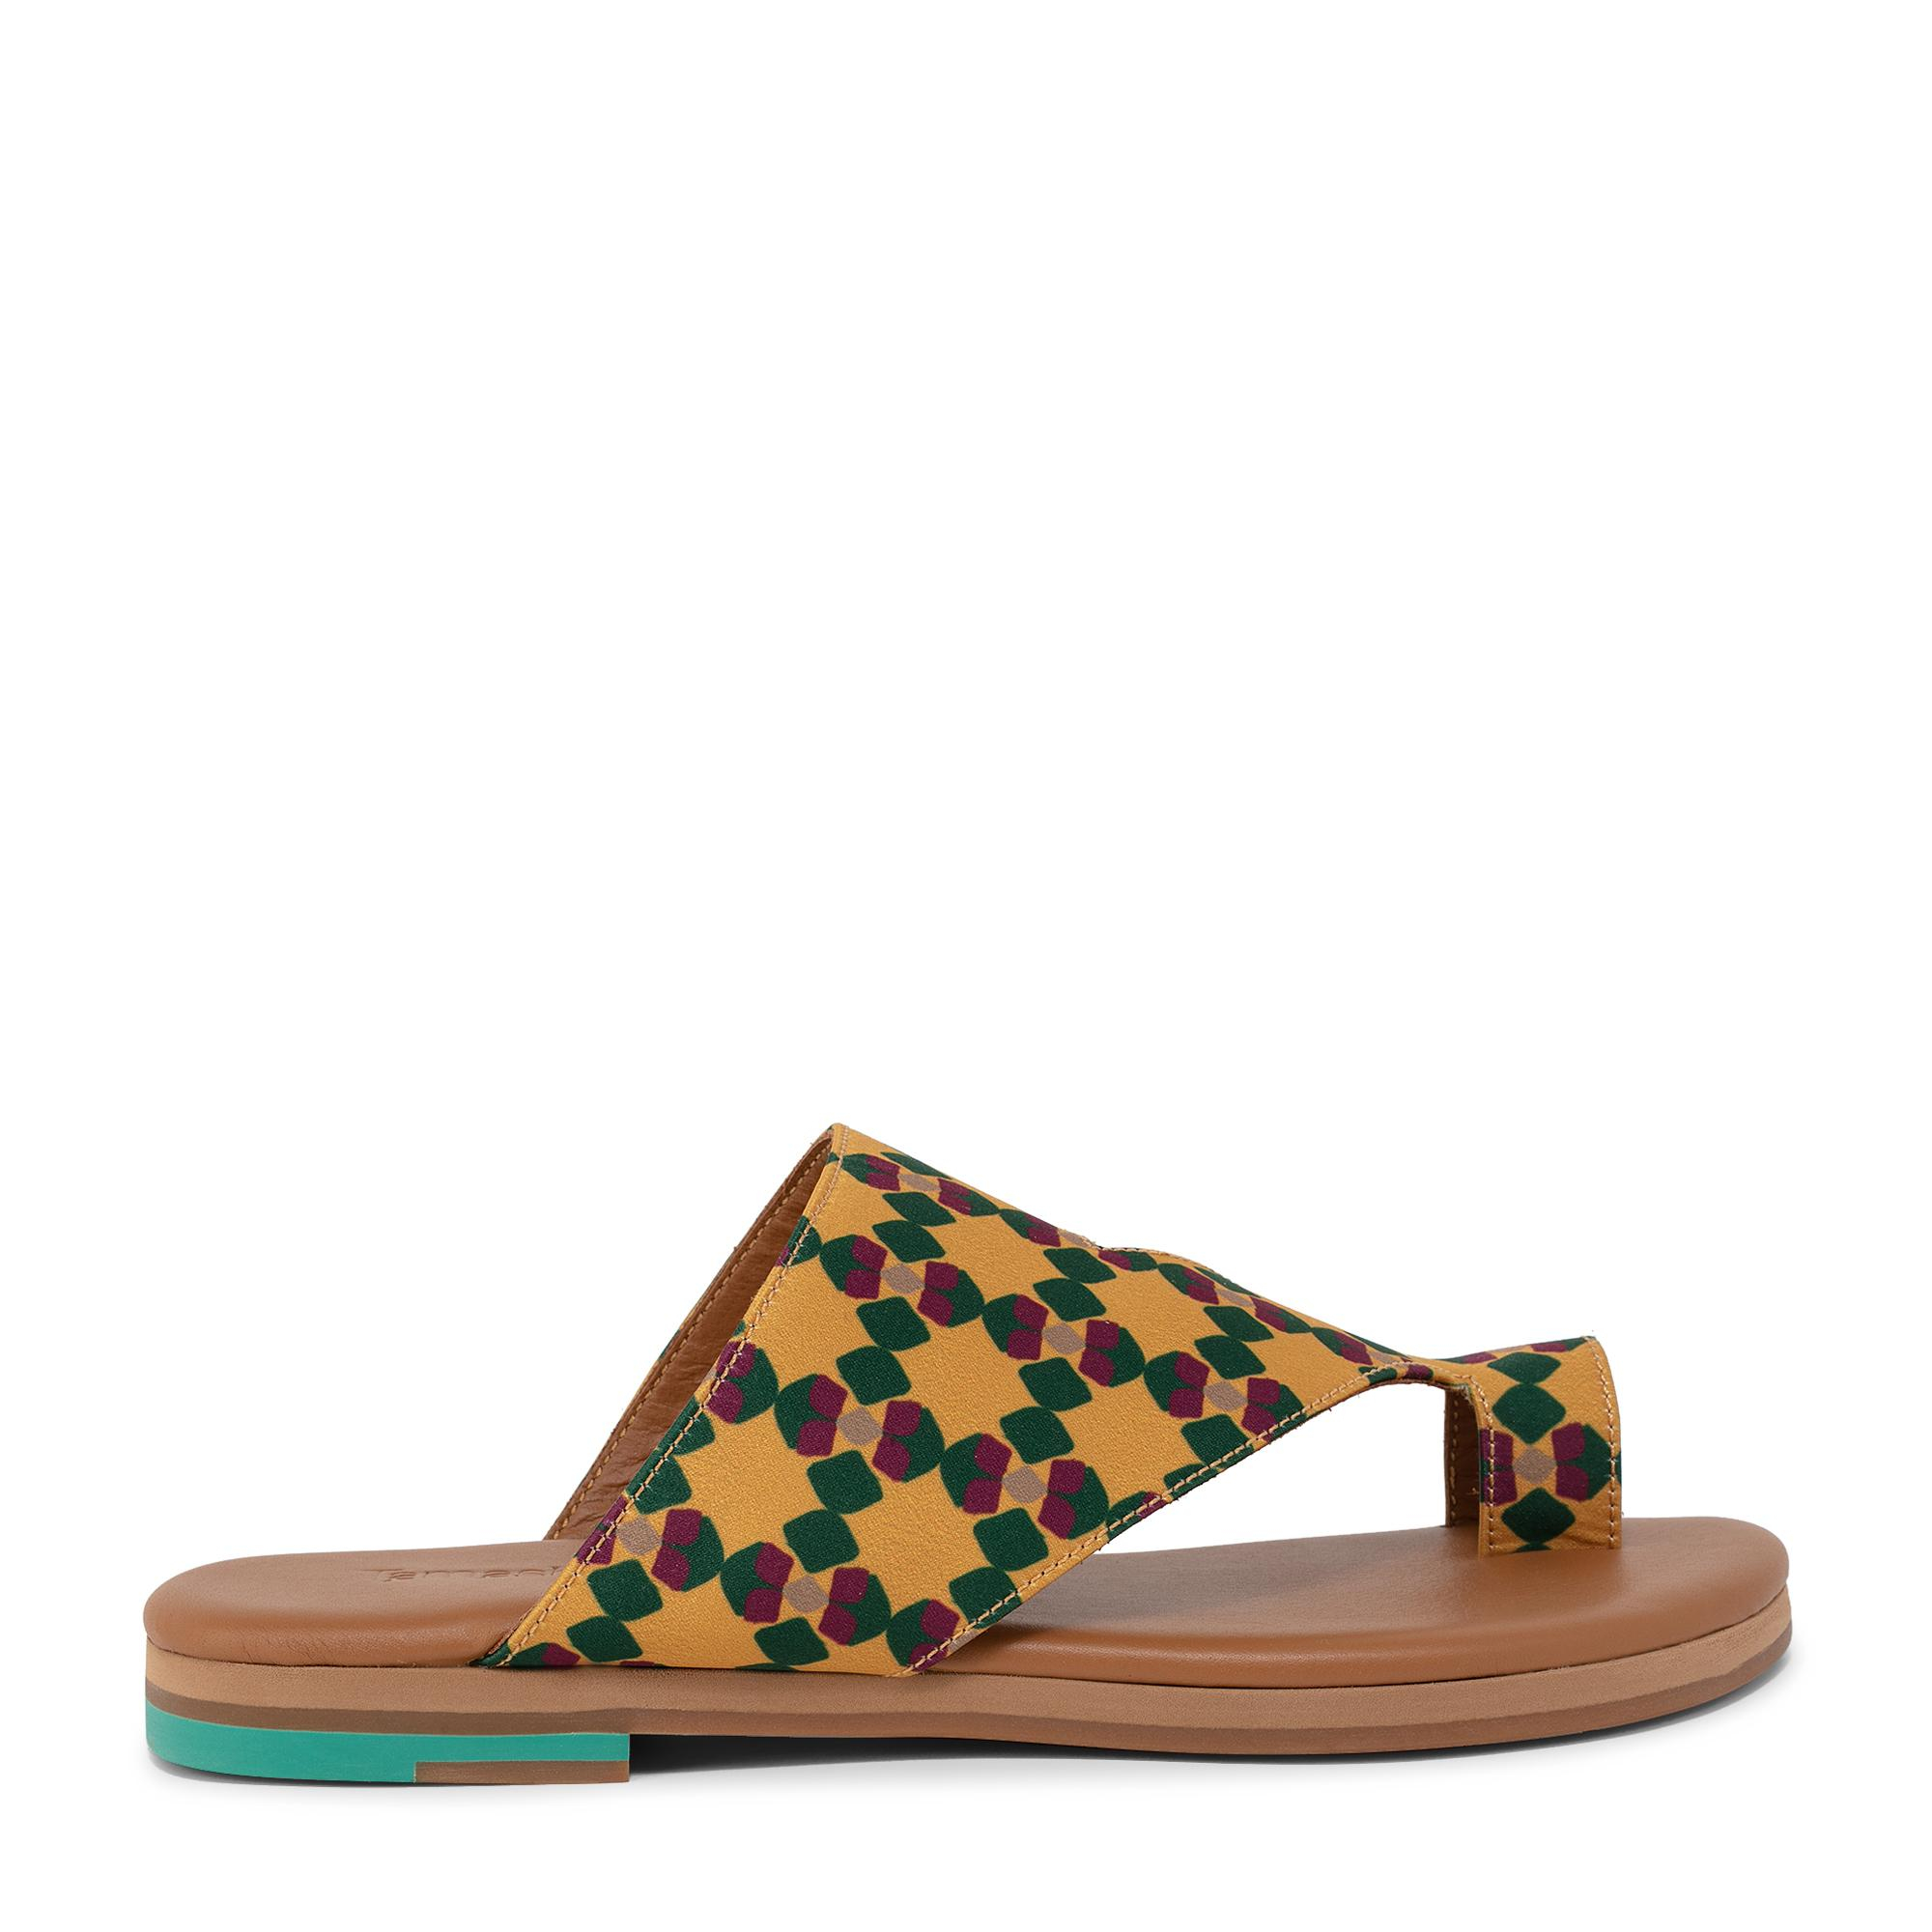 Ashgar sandals